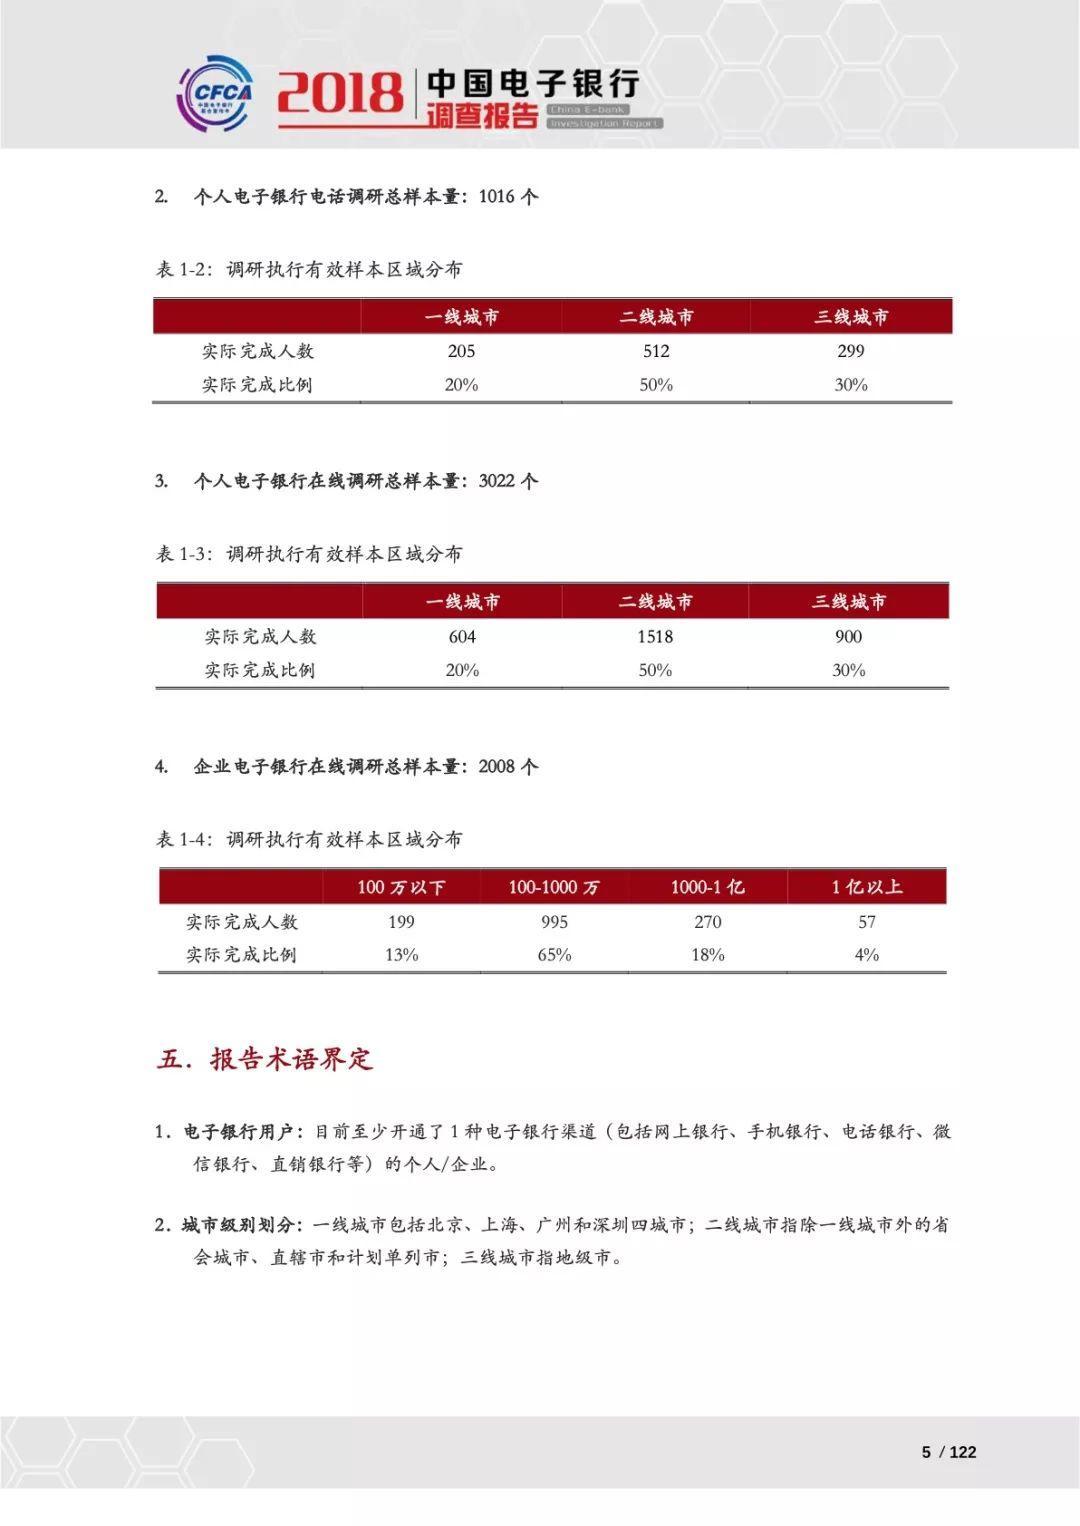 CFCA:2018中国电子银行调查报告—电子银行用户使用行为及态度研究(132页)